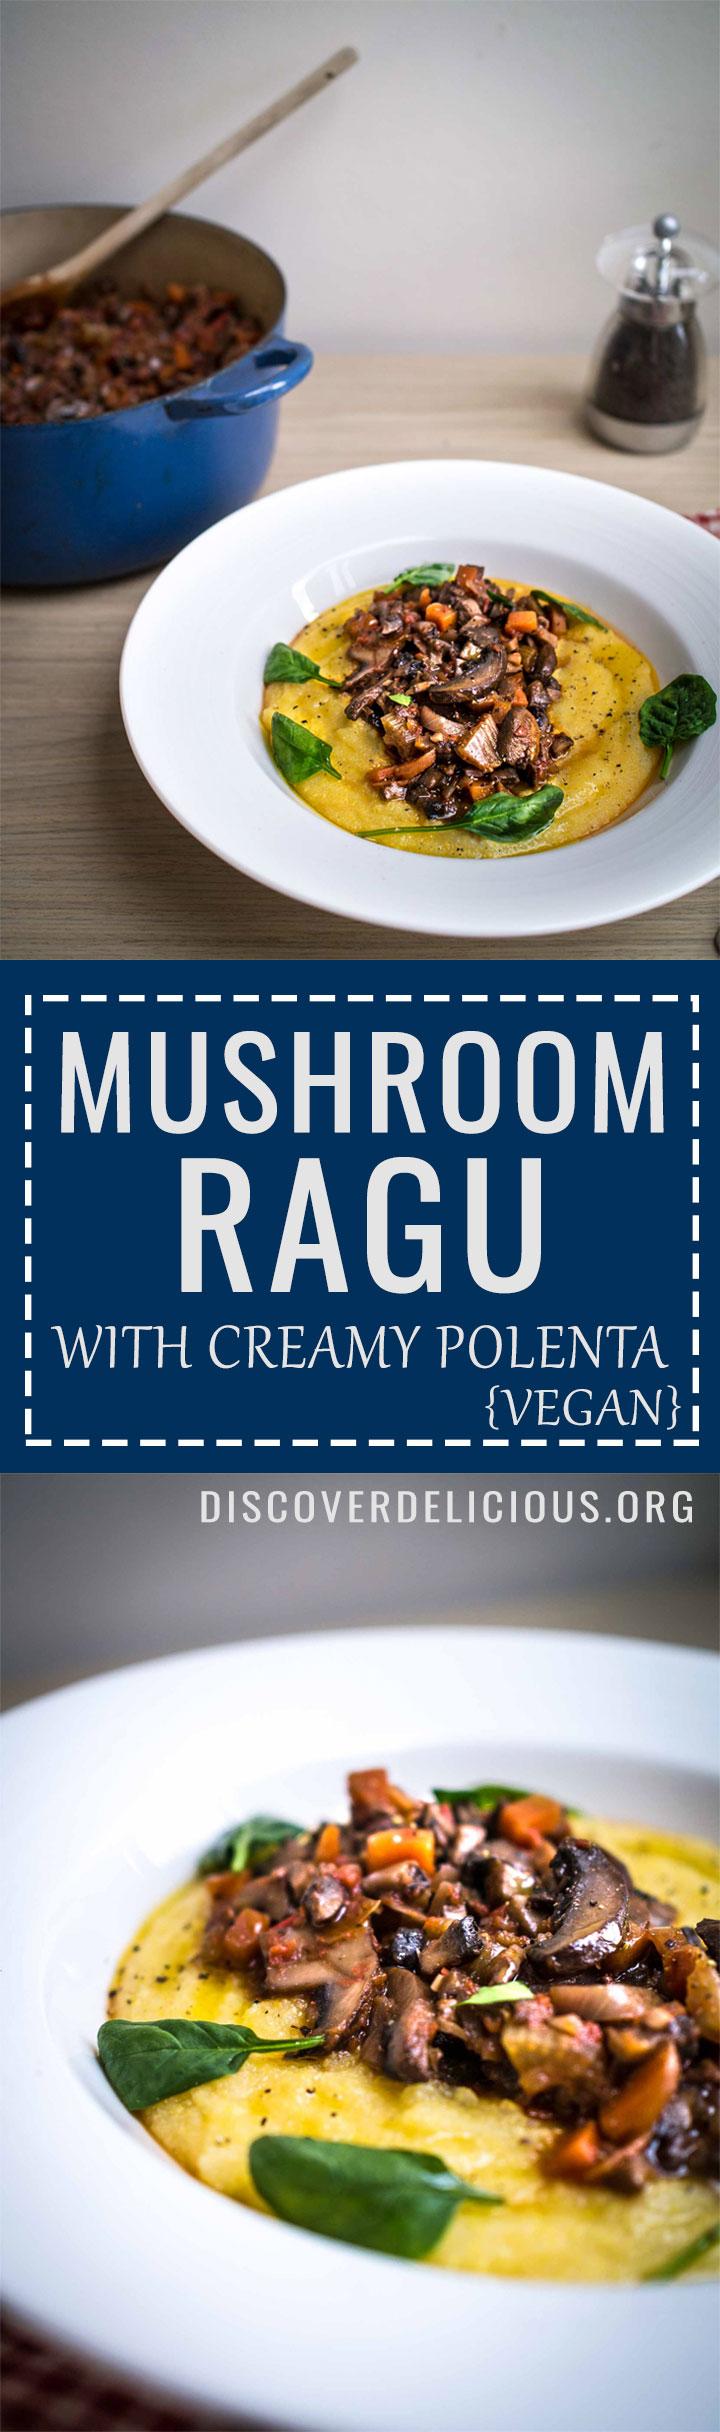 Mushroom Ragu with Creamy Polenta [Vegan] | Discover Delicious | www.discoverdelicious.org | vegan food blog